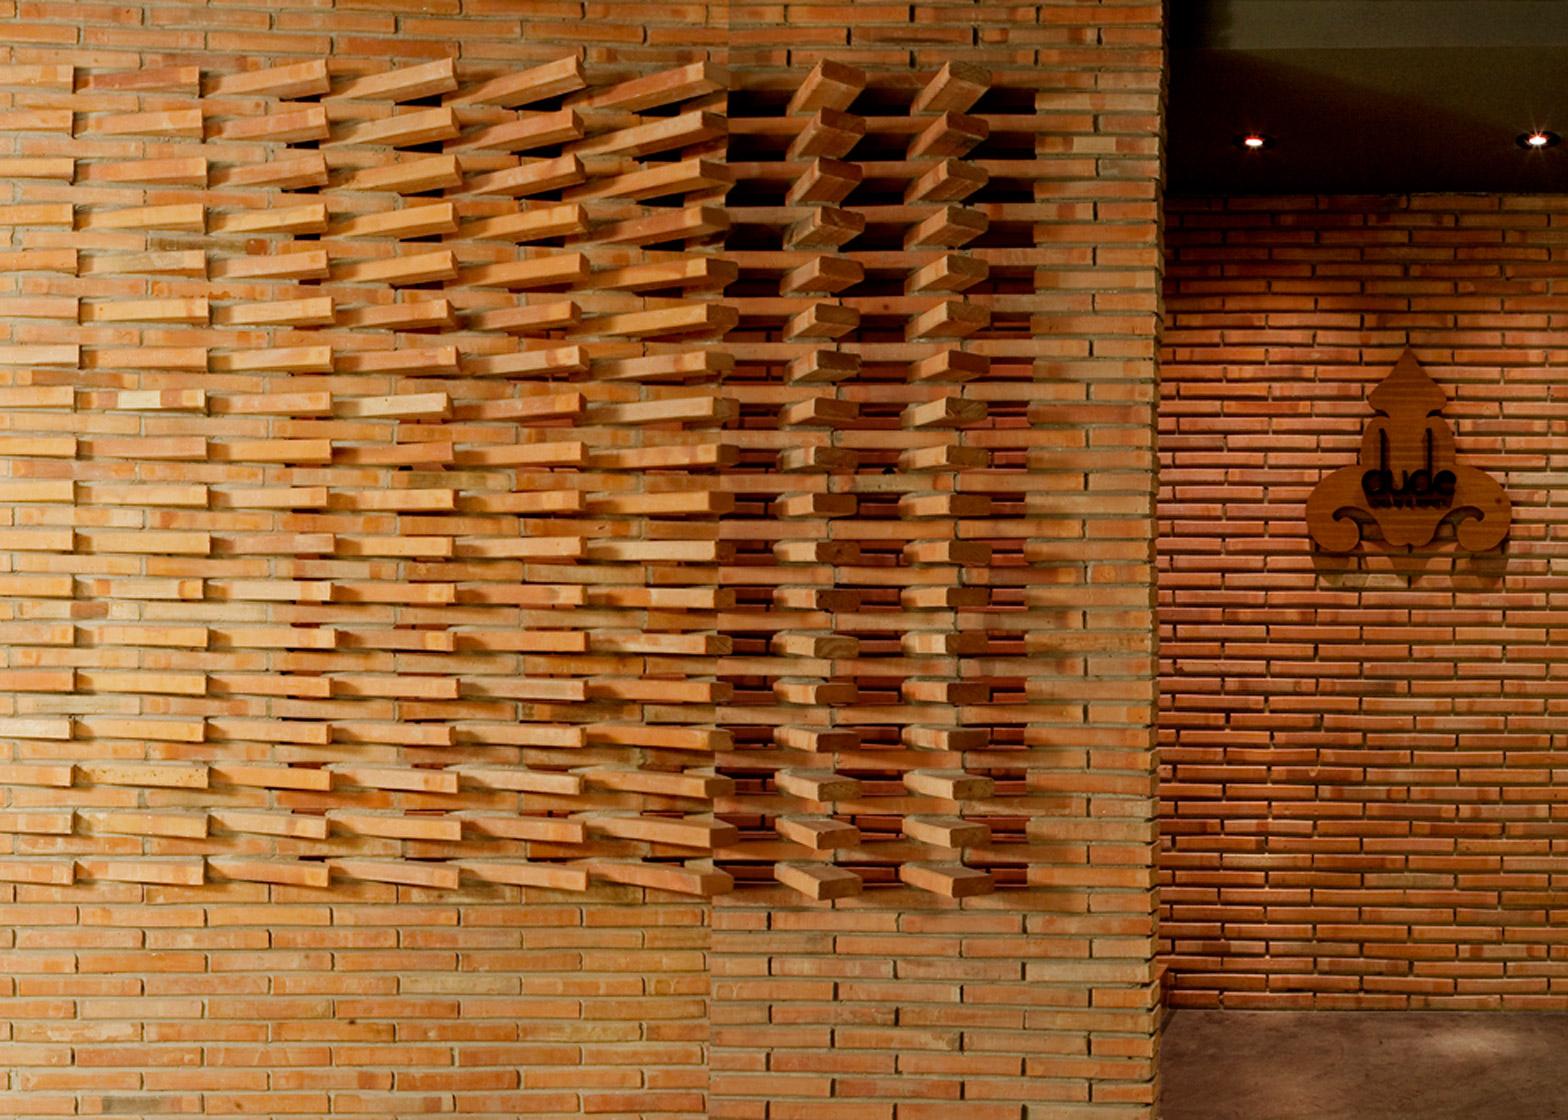 Dude Cigar Bar by Studiomake on the top 10 brick interiors on Dezeen's Pinterest boards